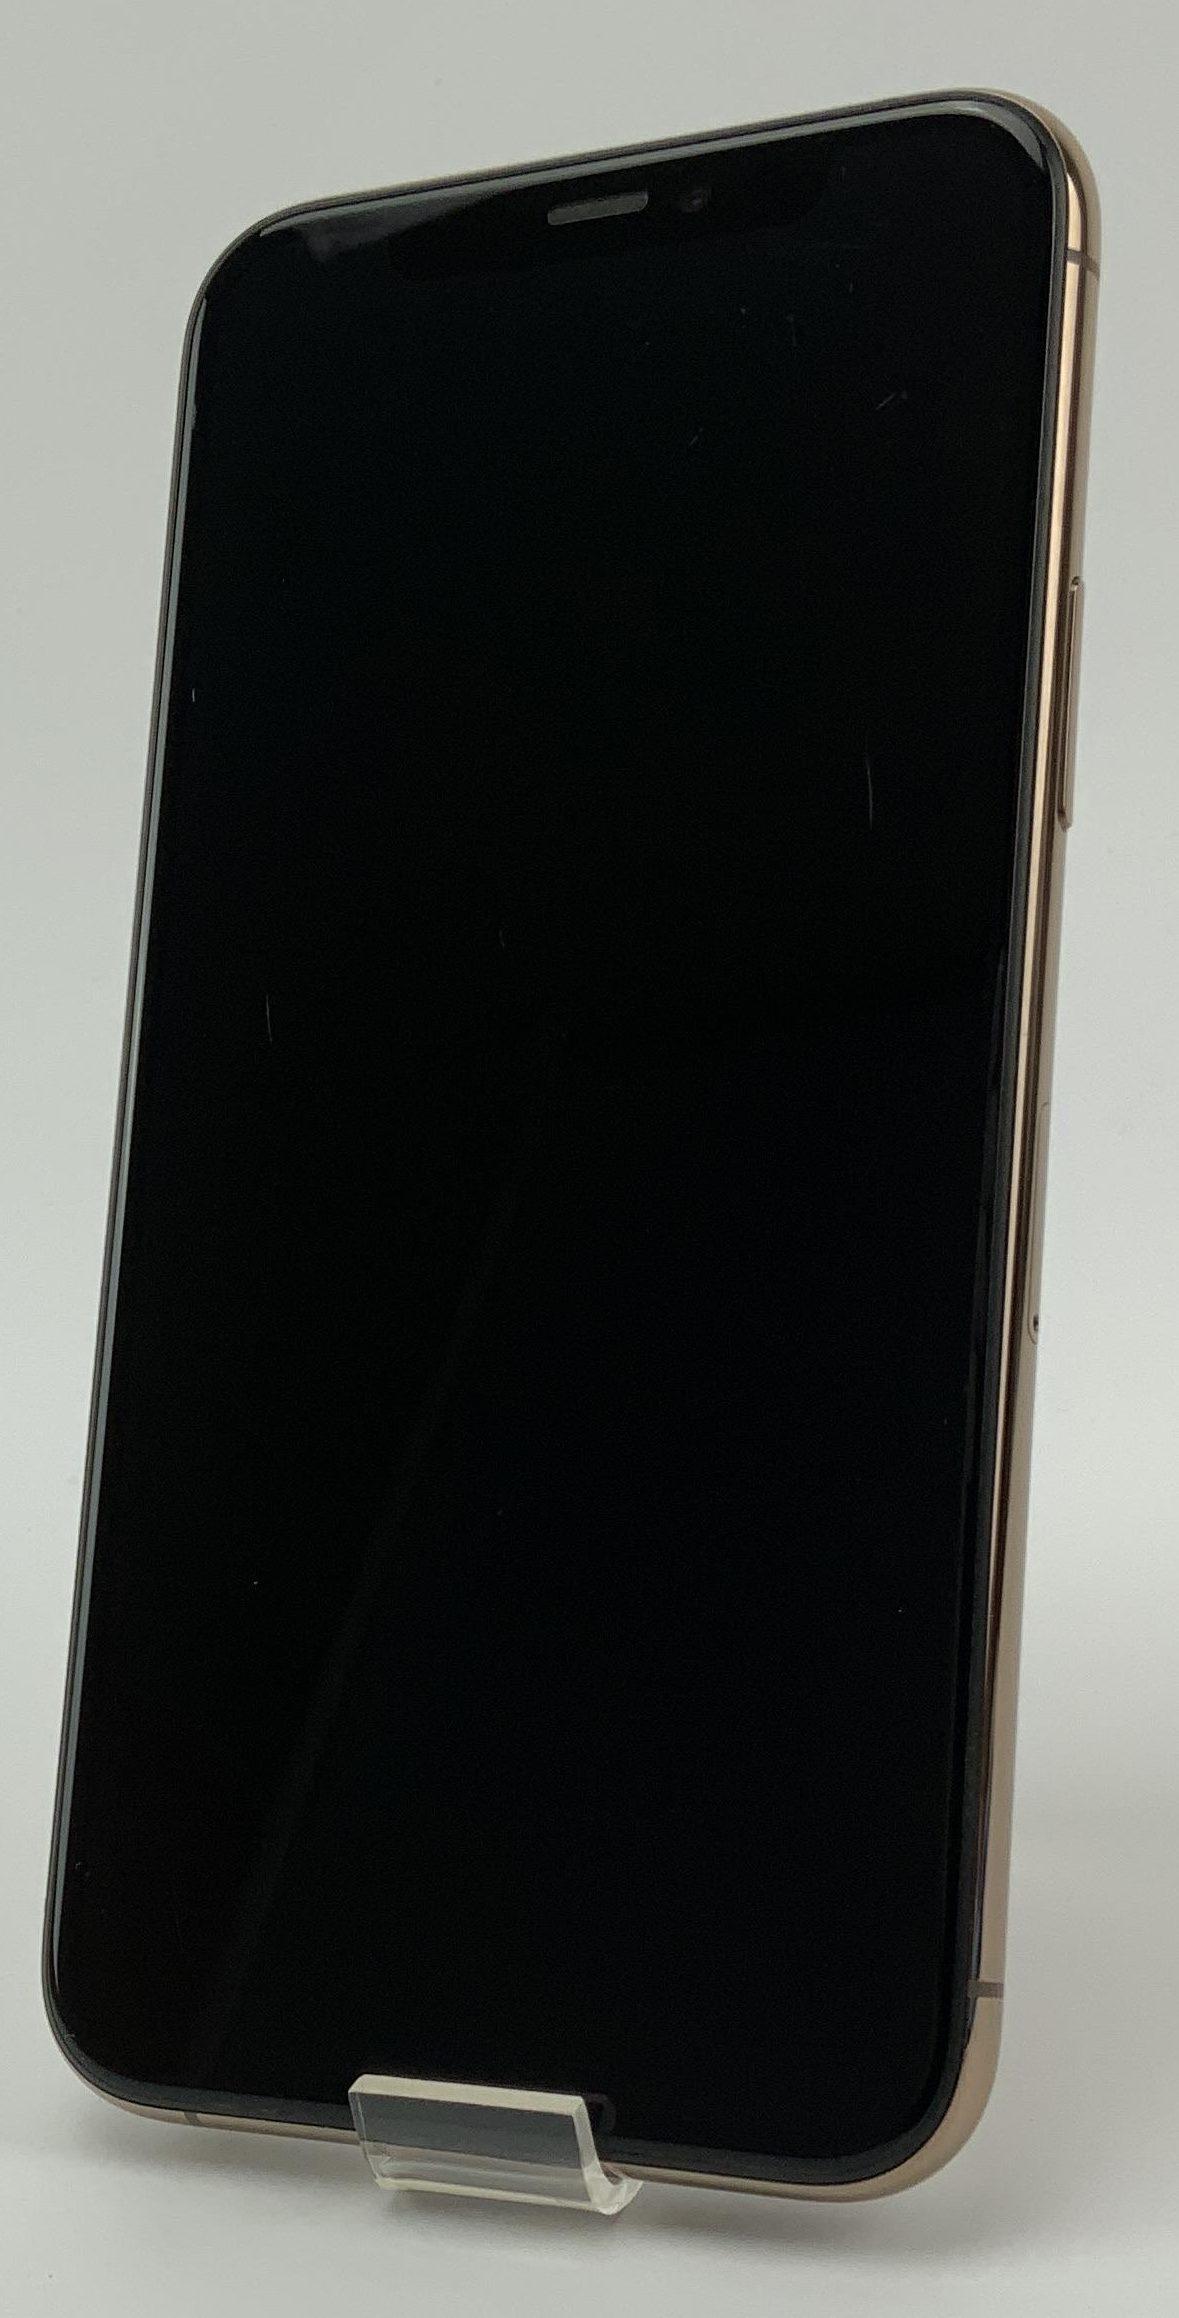 iPhone 11 Pro 64GB, 64GB, Gold, immagine 1